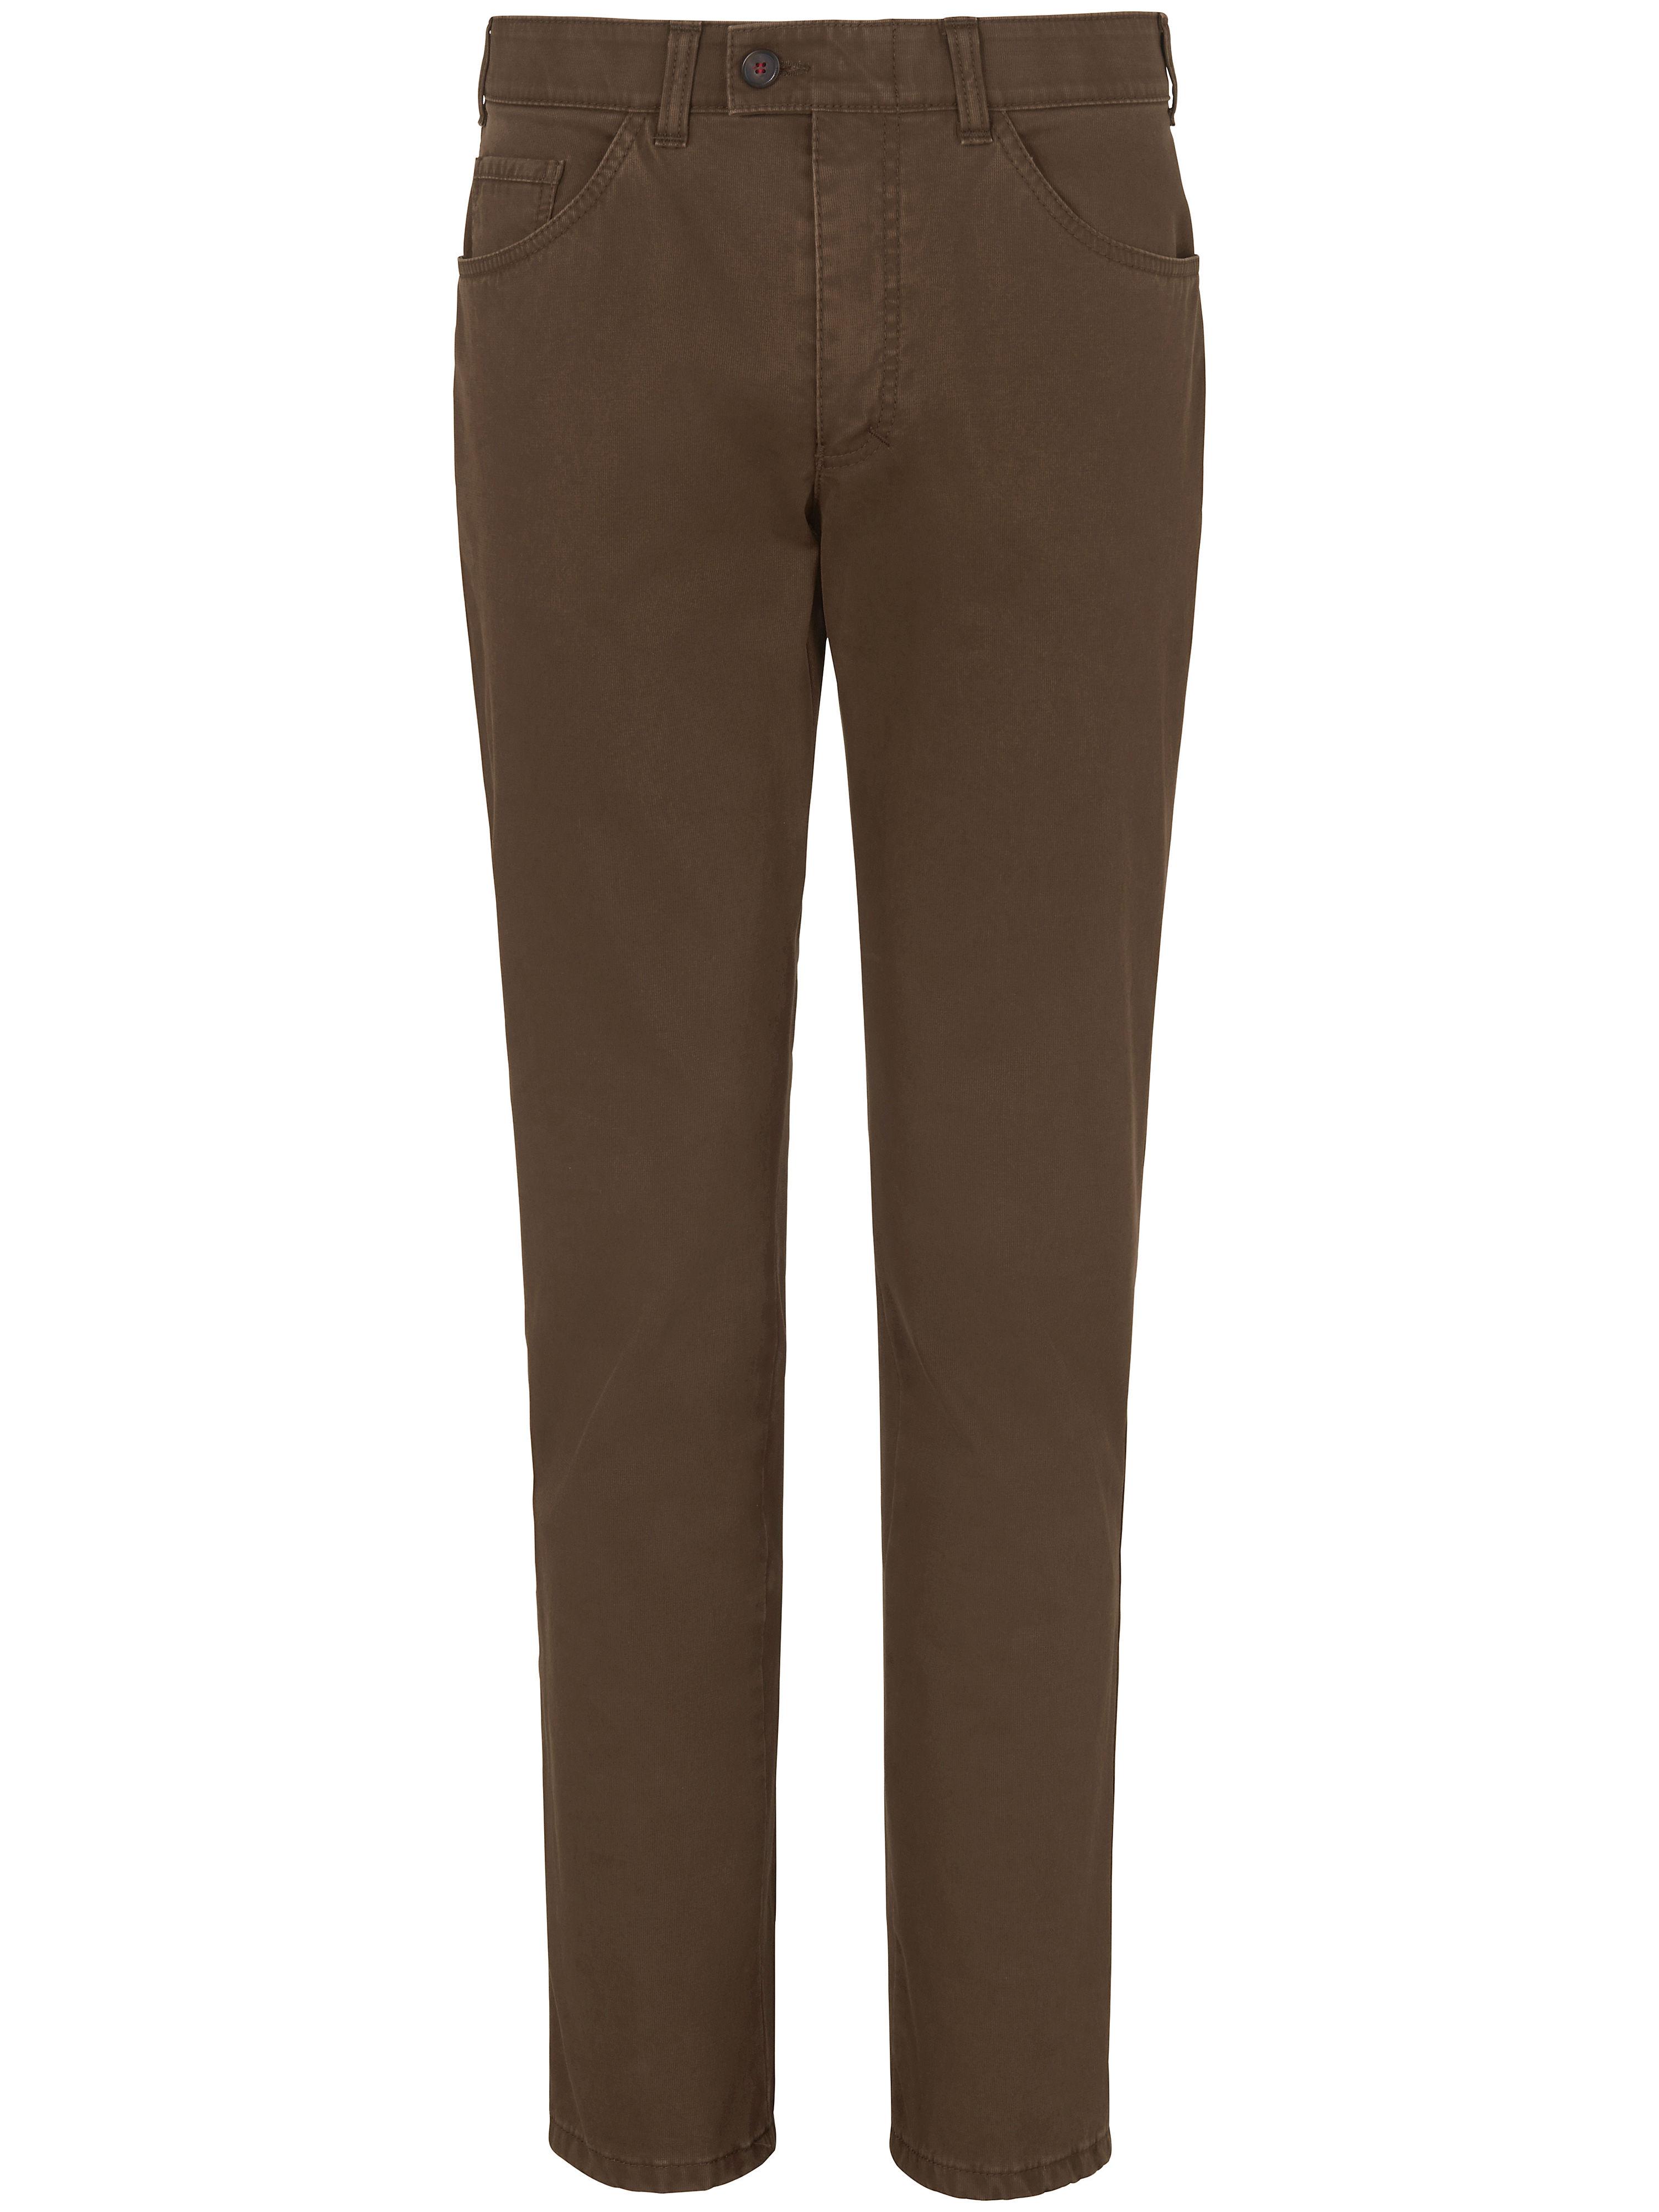 Le pantalon chaud Modèle Keno  CLUB OF COMFORT marron